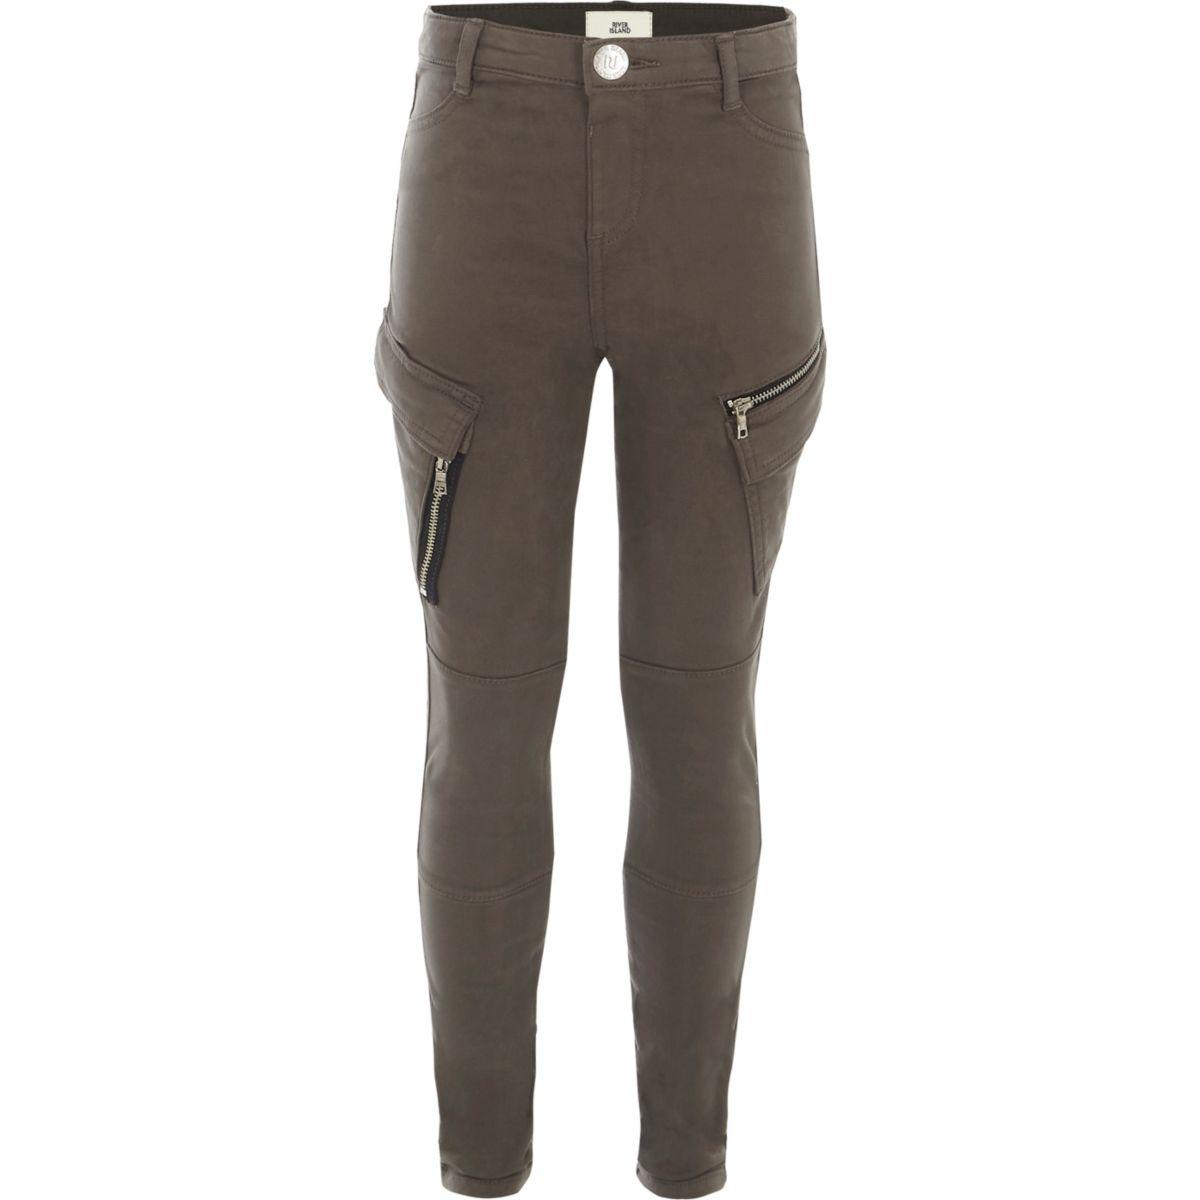 Girls grey skinny fit cargo trousers